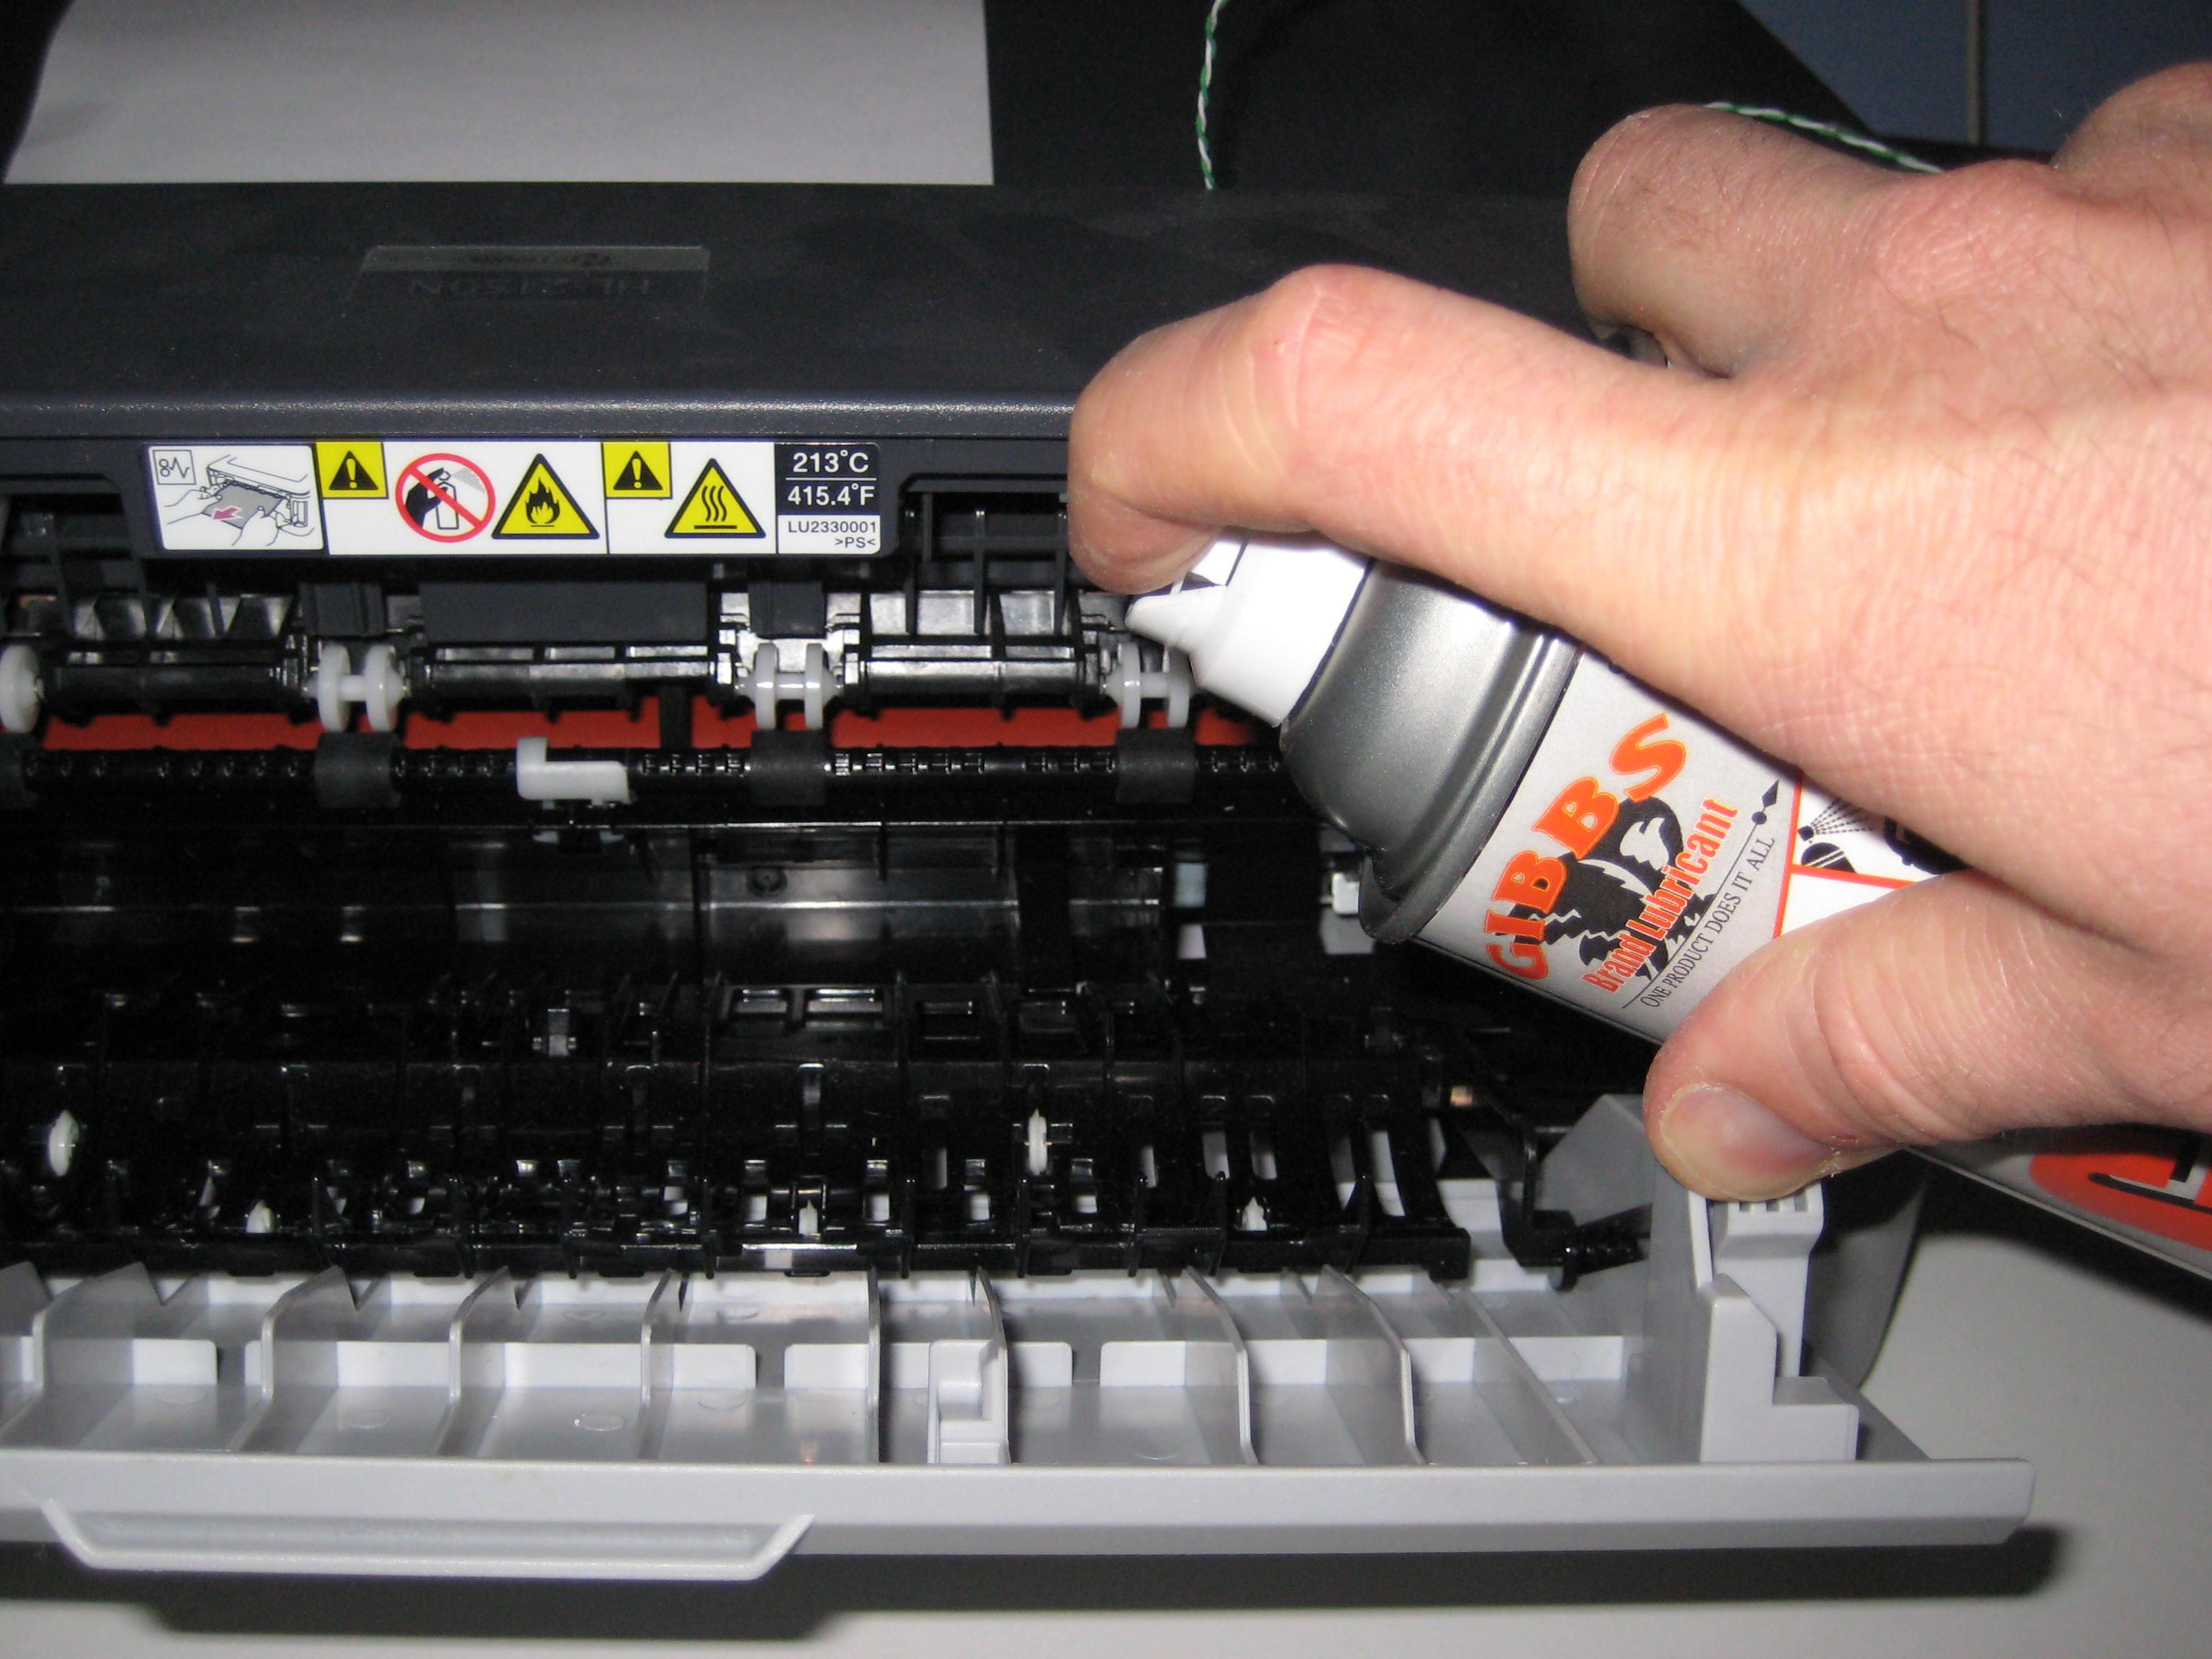 gibbs brand works fixing a squeaky brother hl 2150n laser printer the gibbs brand blog. Black Bedroom Furniture Sets. Home Design Ideas